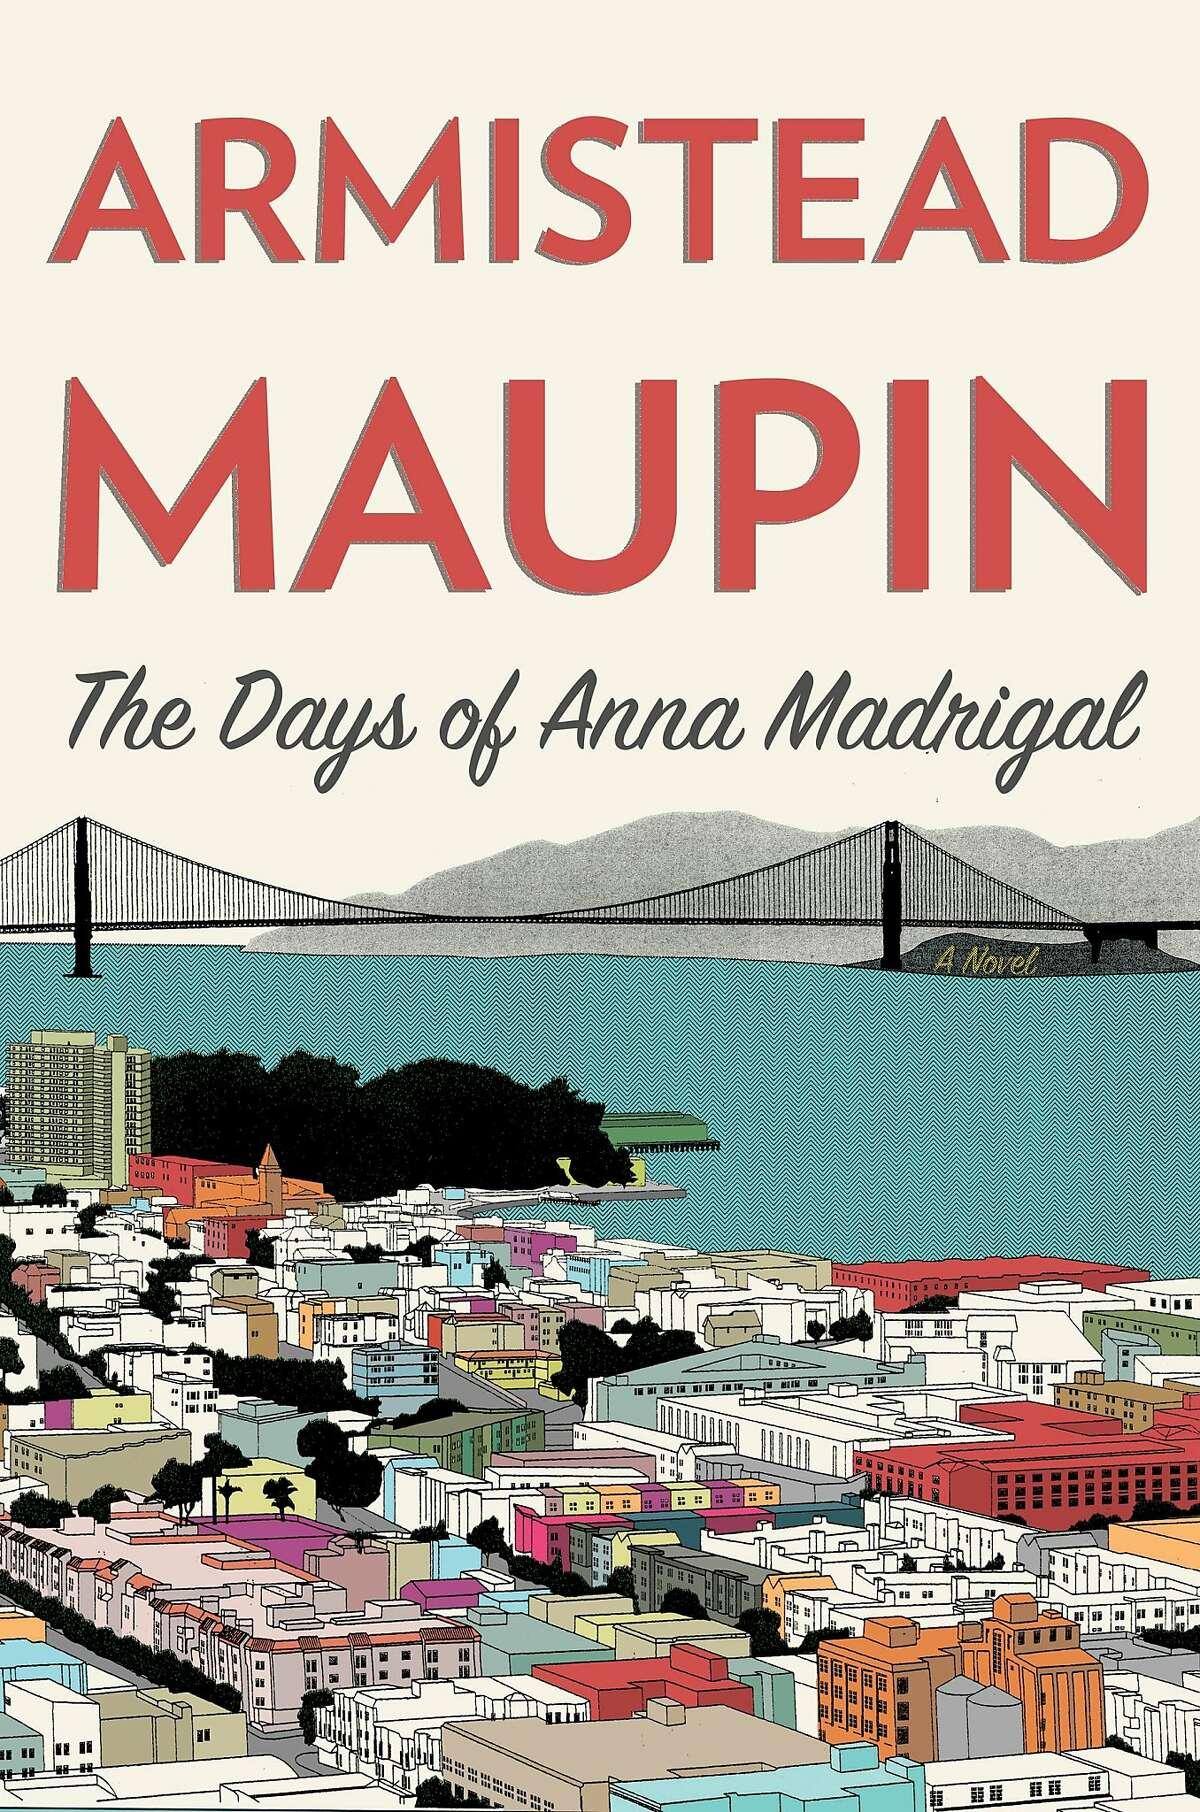 The Days of Anna Madrigal, by Armistead Maupin